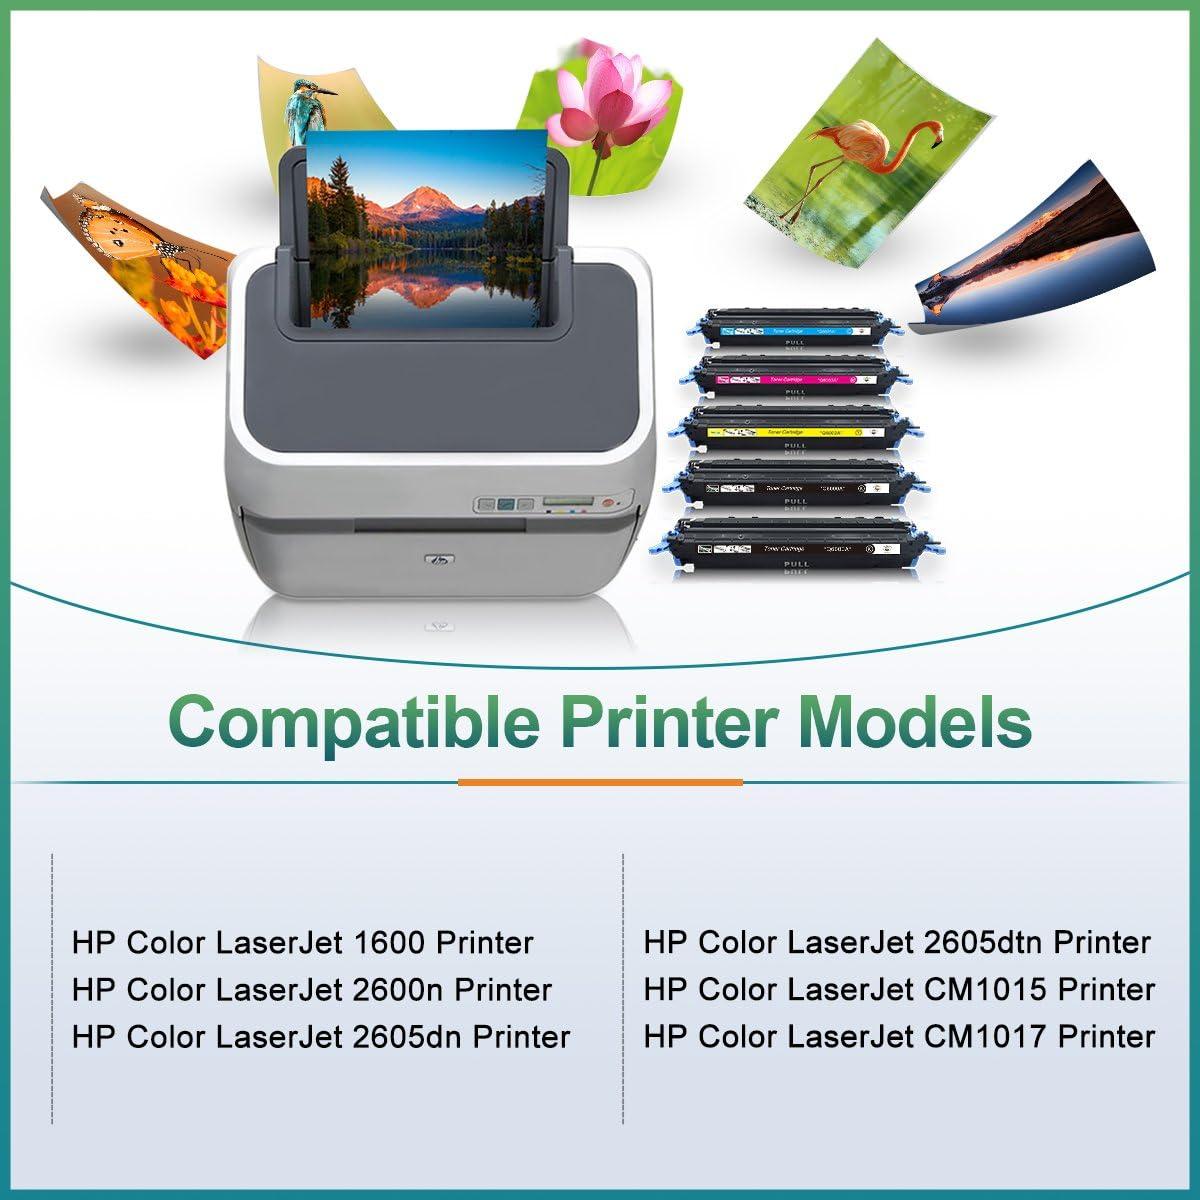 Magenta Toner Cartridge for HP 124A Q6003A LaserJet 1600 2600n 2605dn CM1017mfp